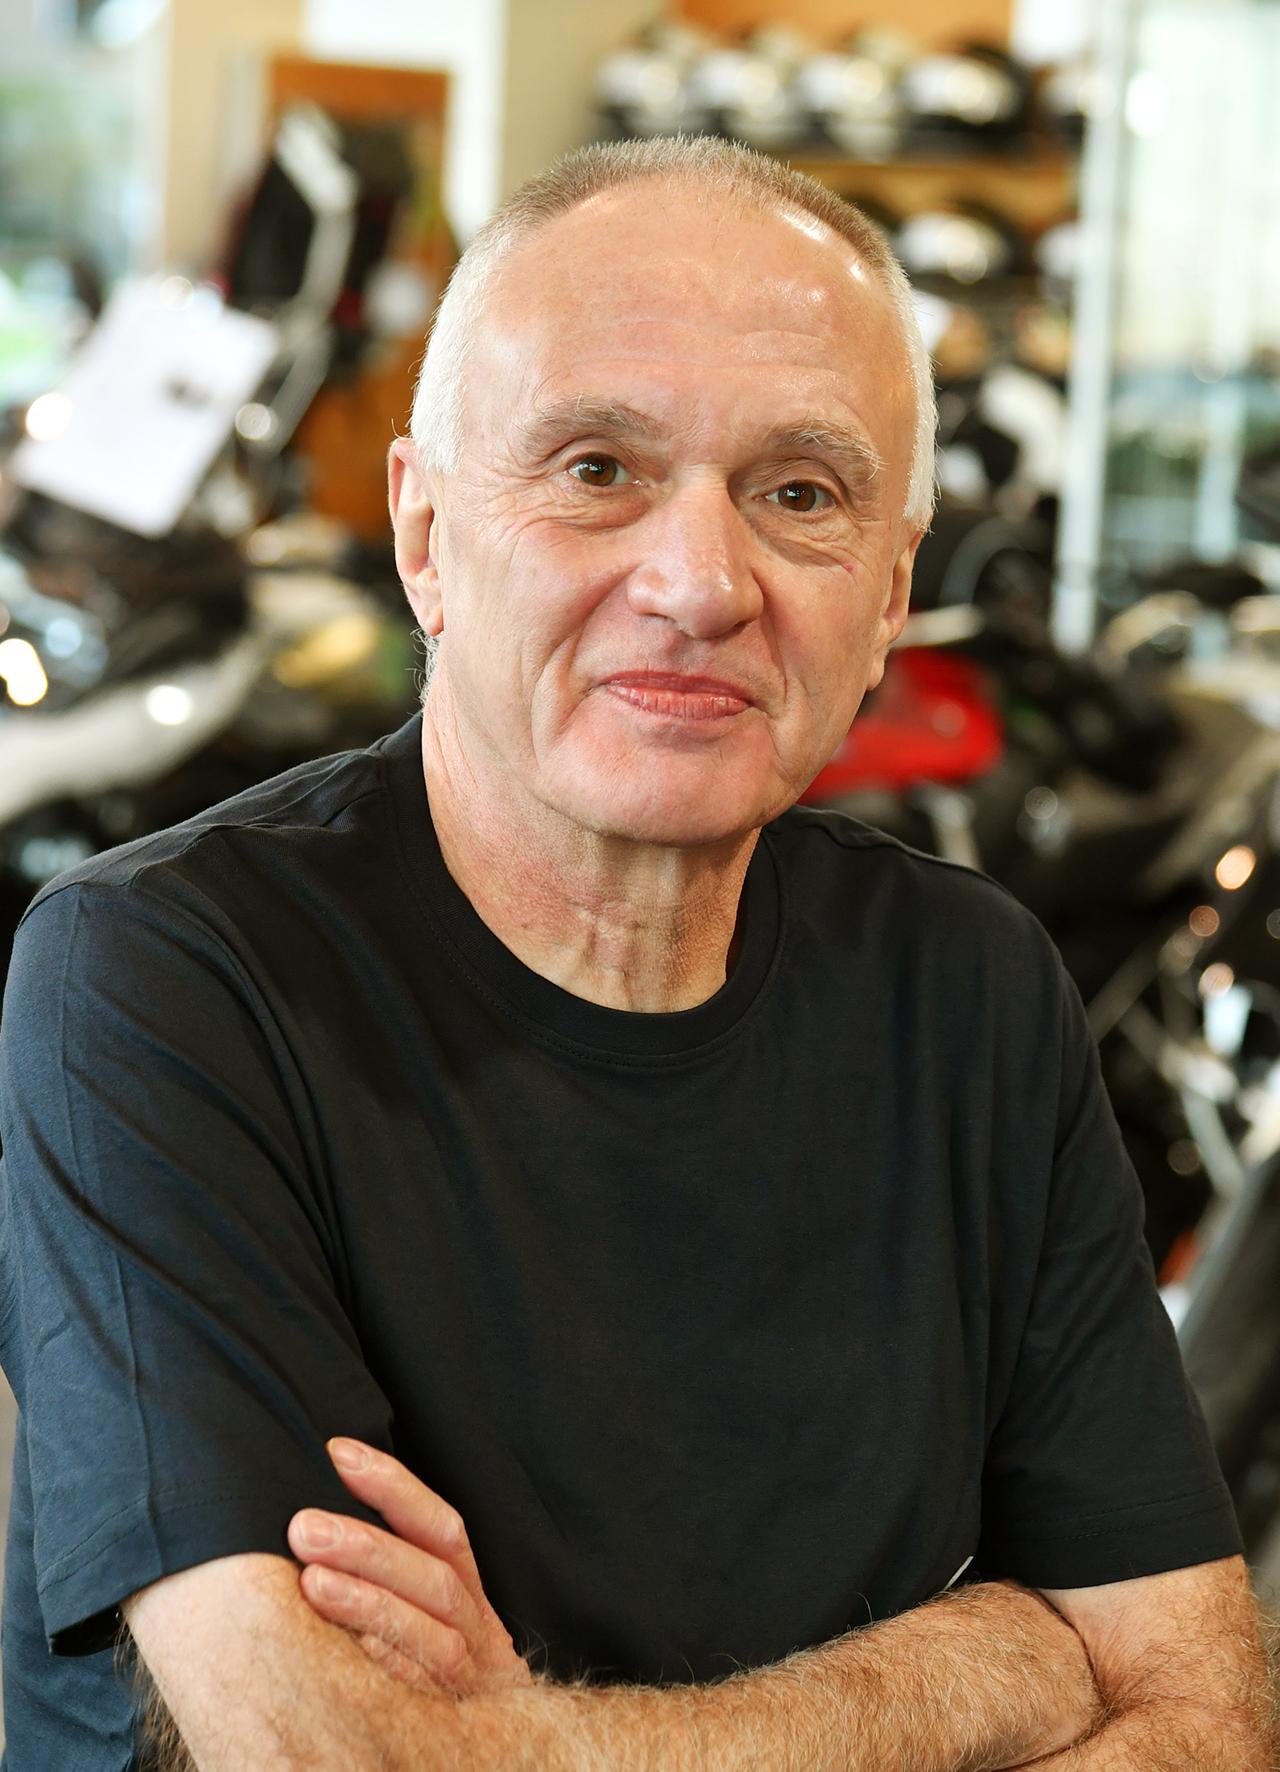 Dirk Moortgat